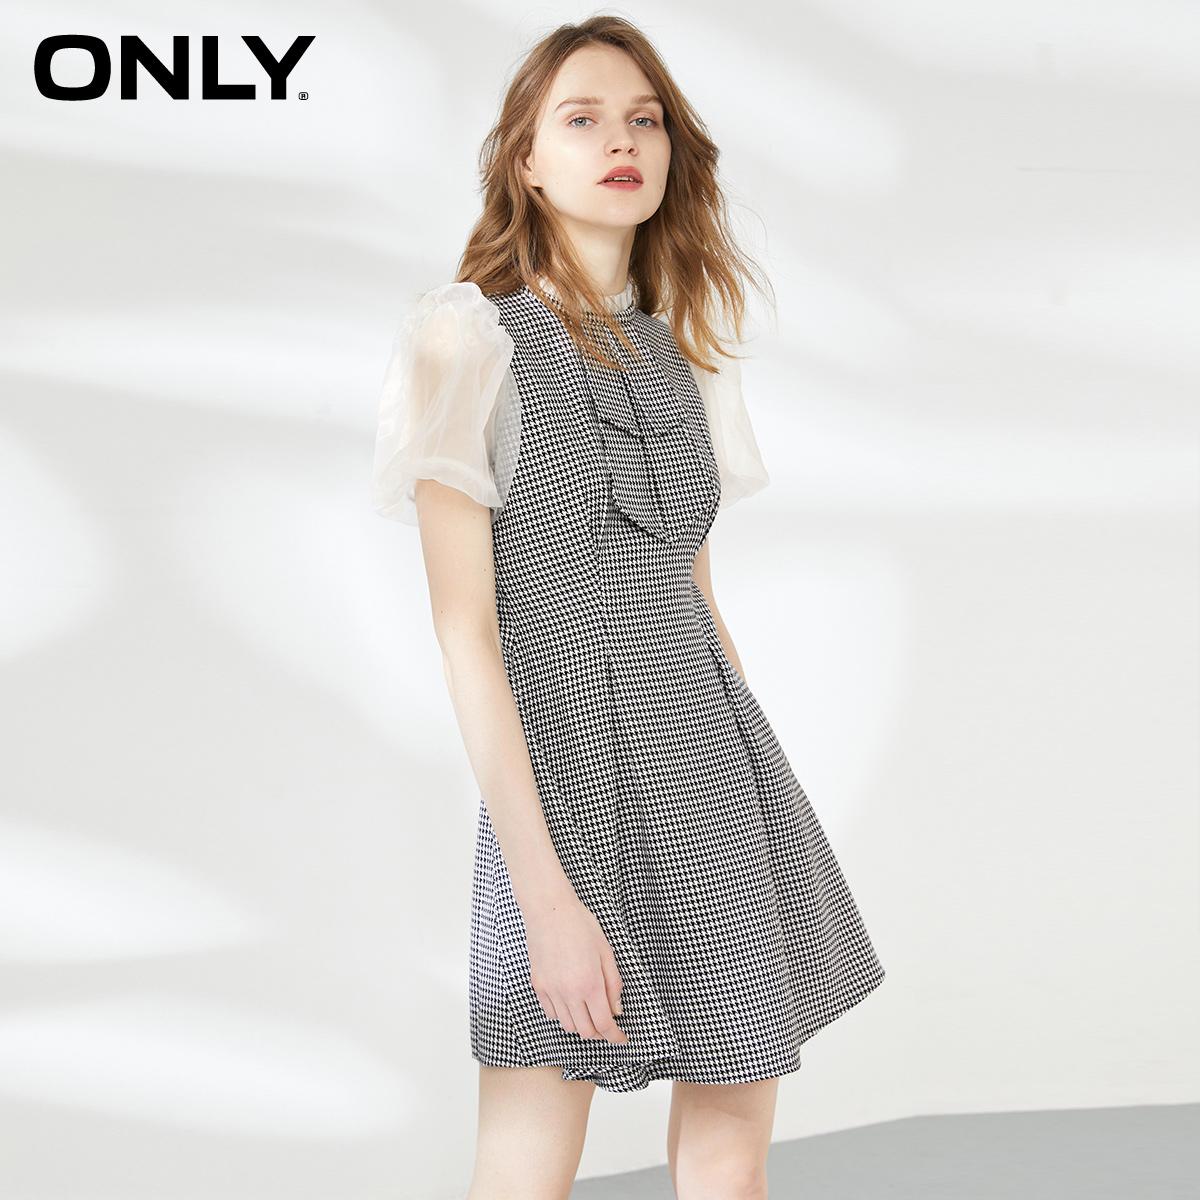 ONLY2020夏季新款气质蕾丝拼接泡泡袖收腰赫本连衣裙女|120107680